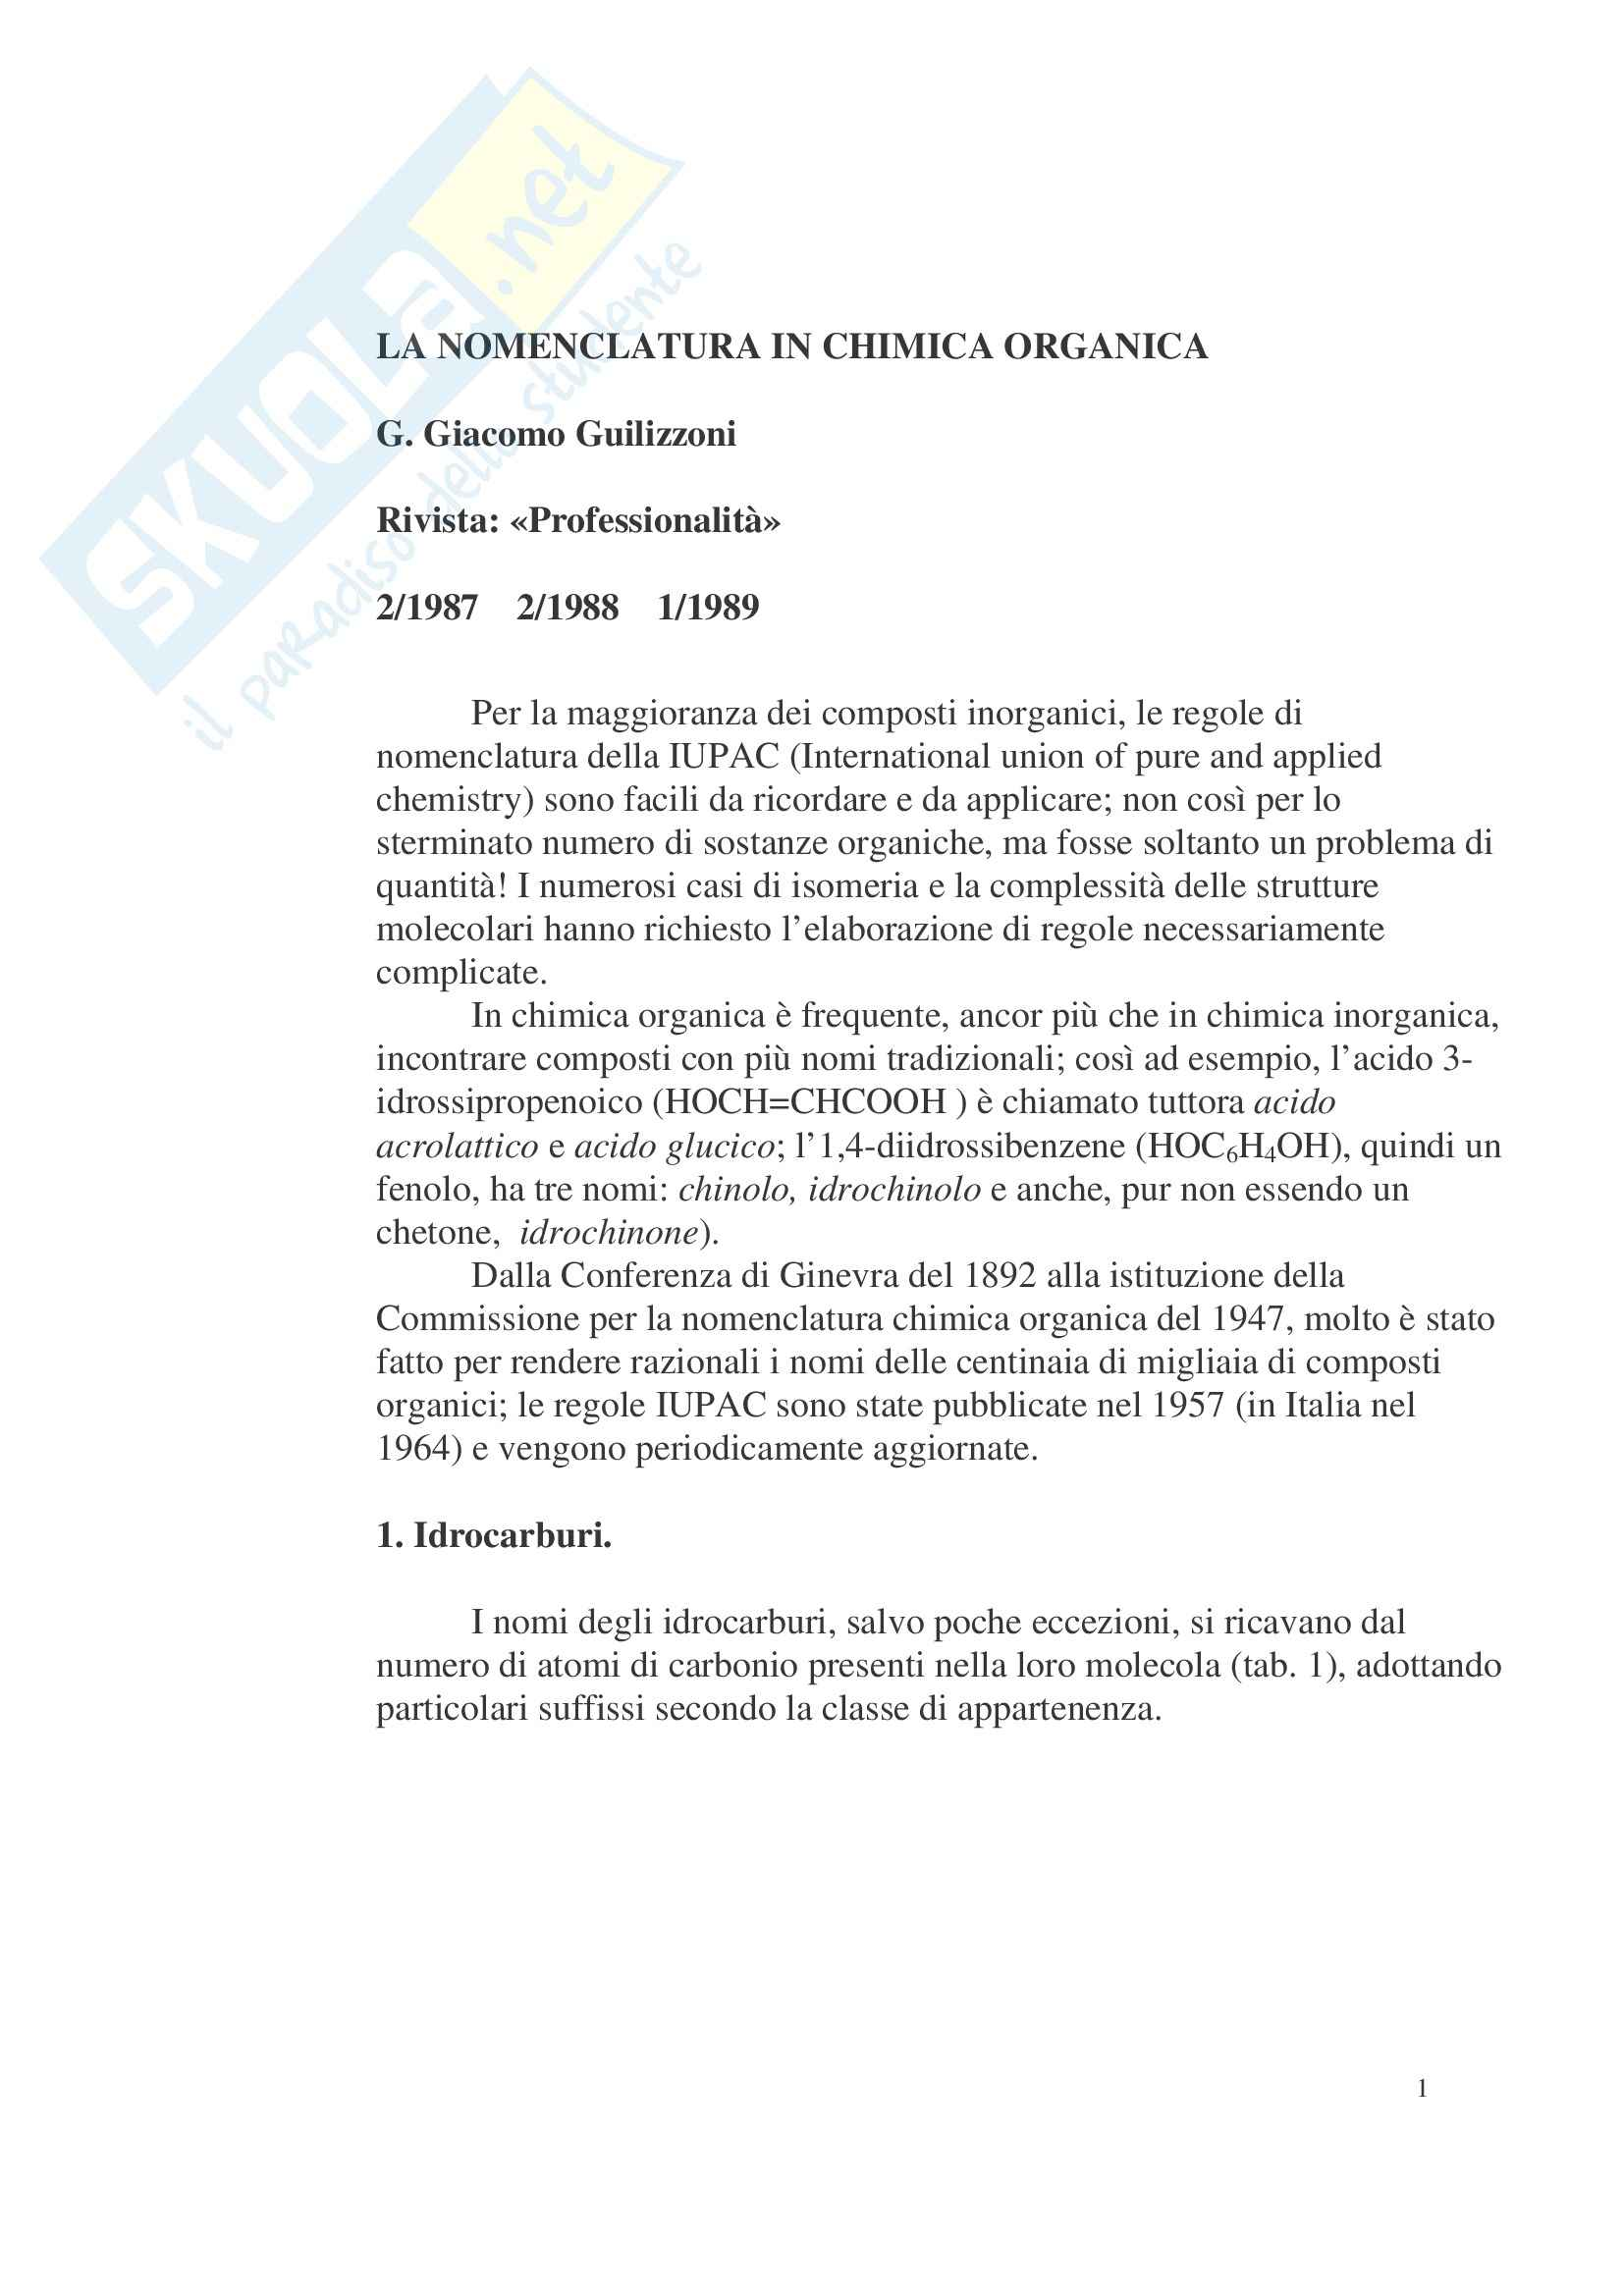 Chimica organica - nomenclatura Pag. 1